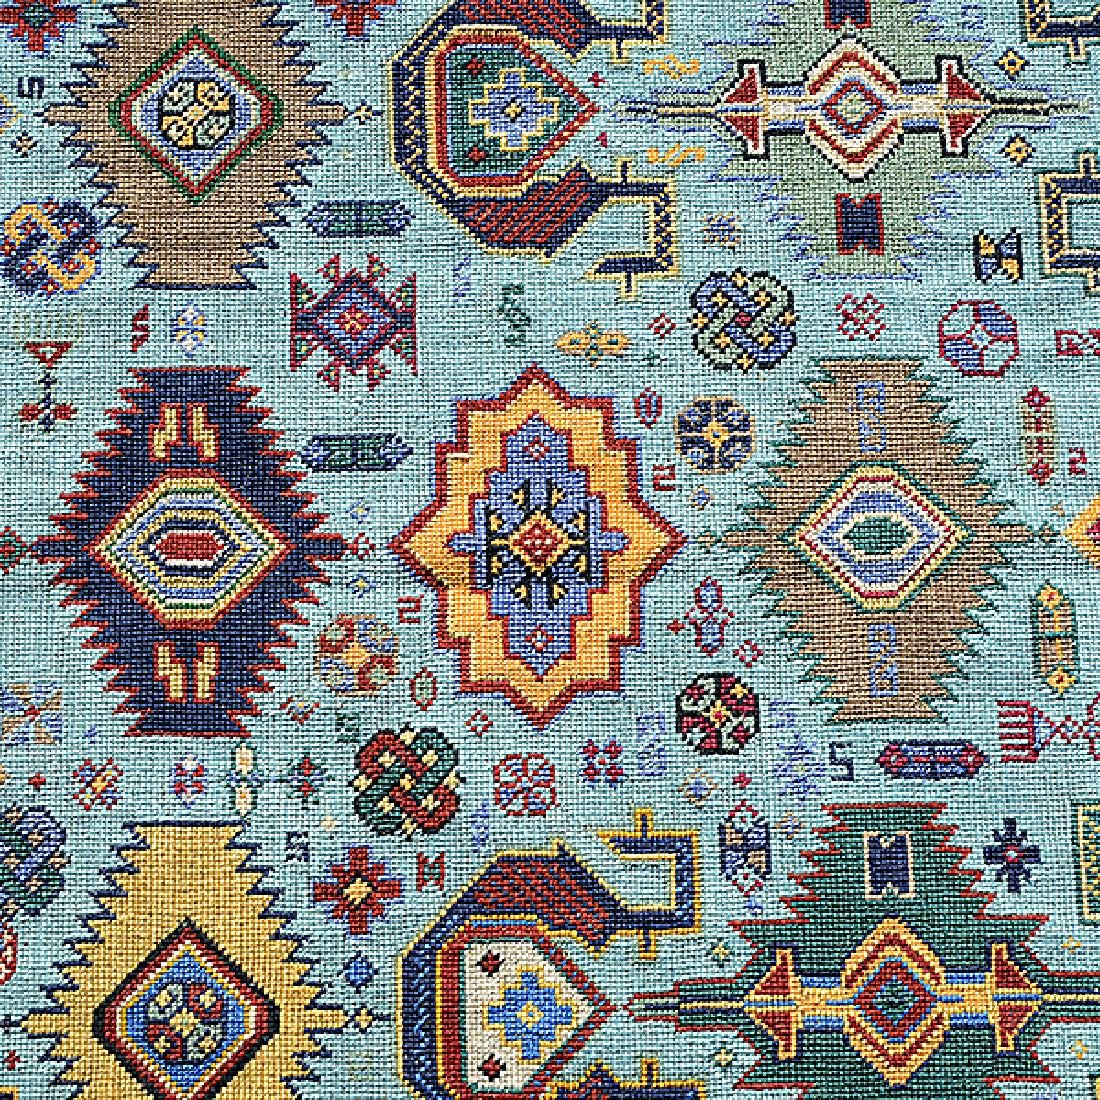 Kazak Souzani Needlework Rug: 4 feet 1 inch x 7 feet - 4